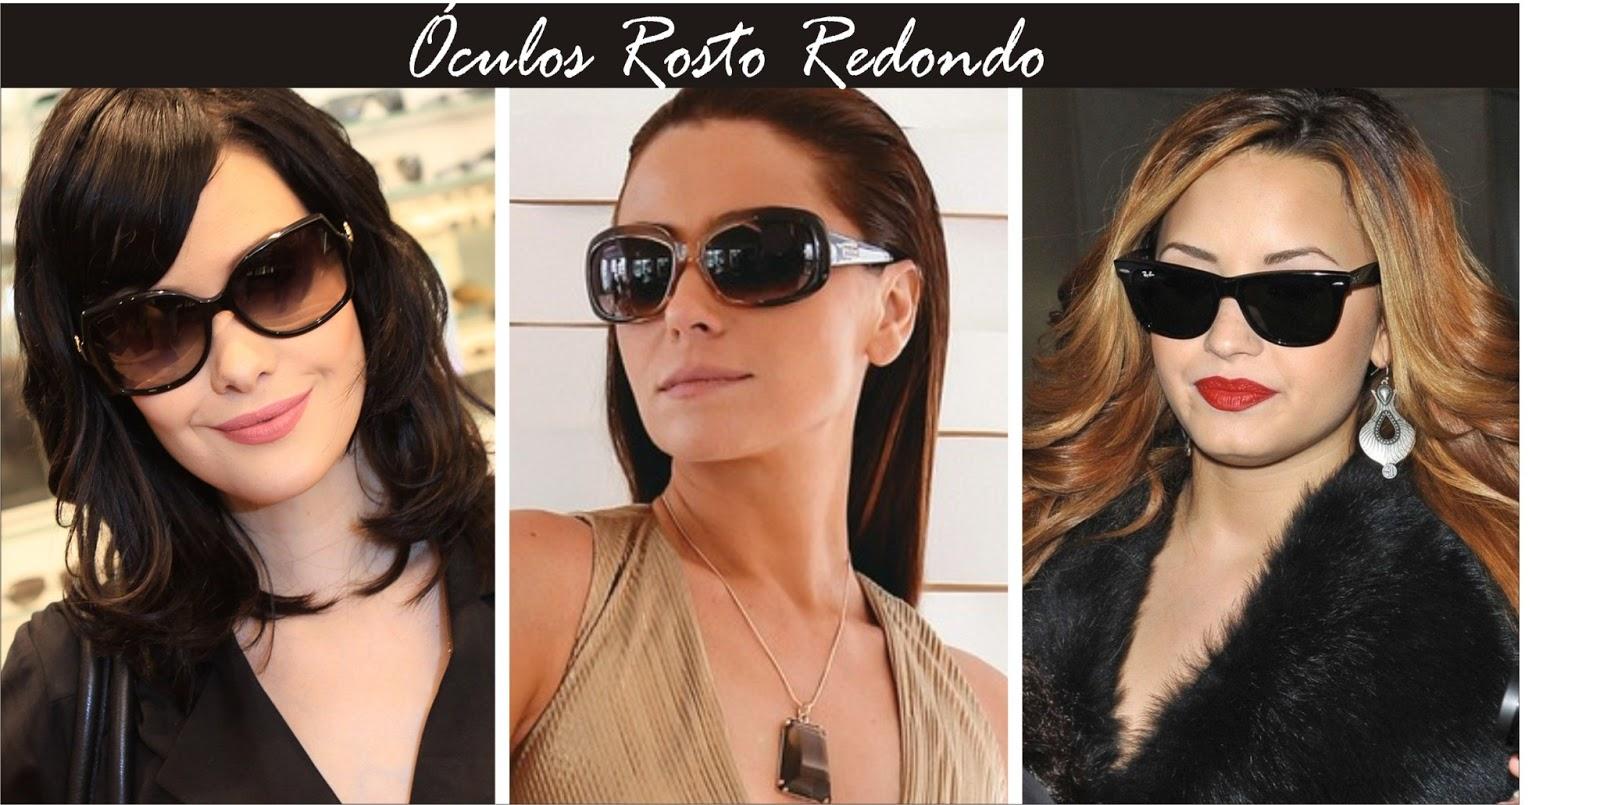 1dba8f8264bc5 Oculos Feminino De Sol Para Rosto Redondo   Louisiana Bucket Brigade